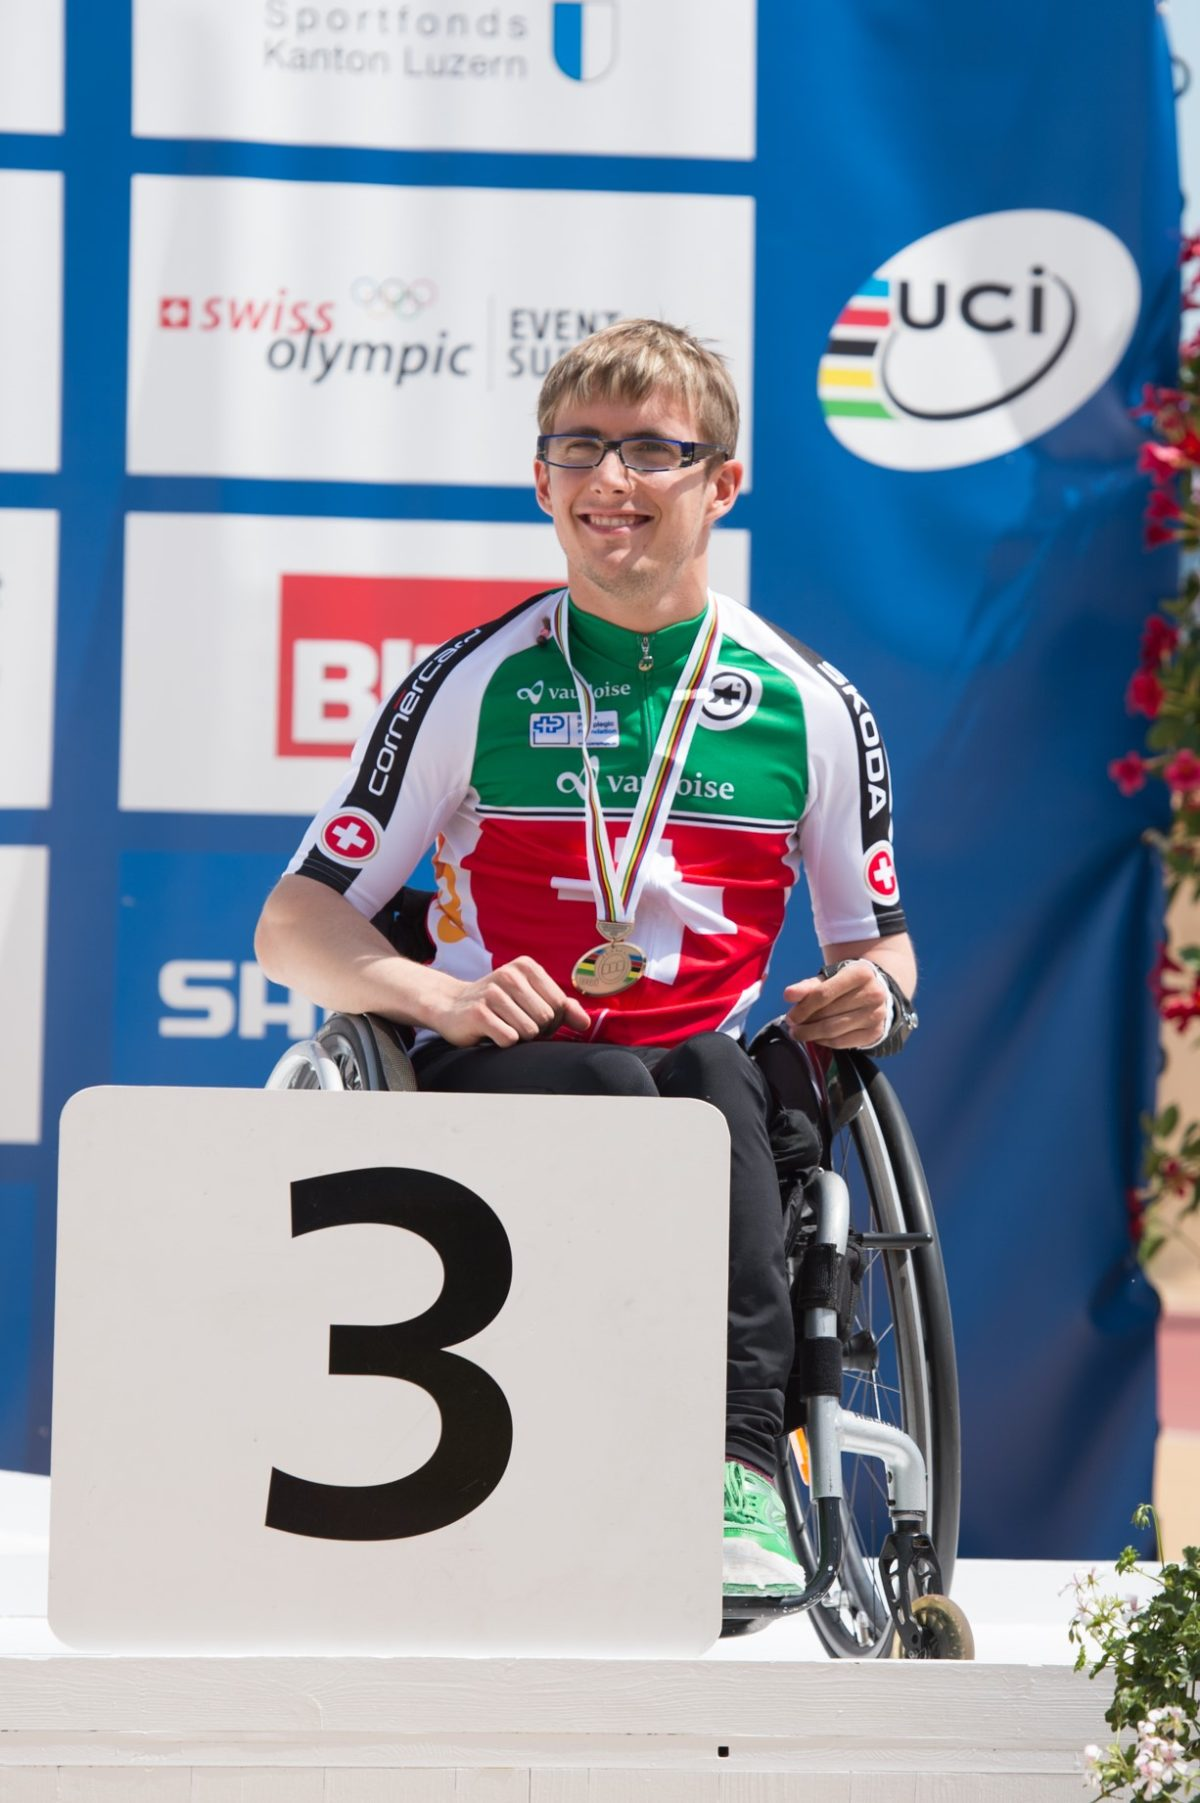 Benjamin Frueh Siegerehrung UCI Para-cycling WM Nottwil 2015